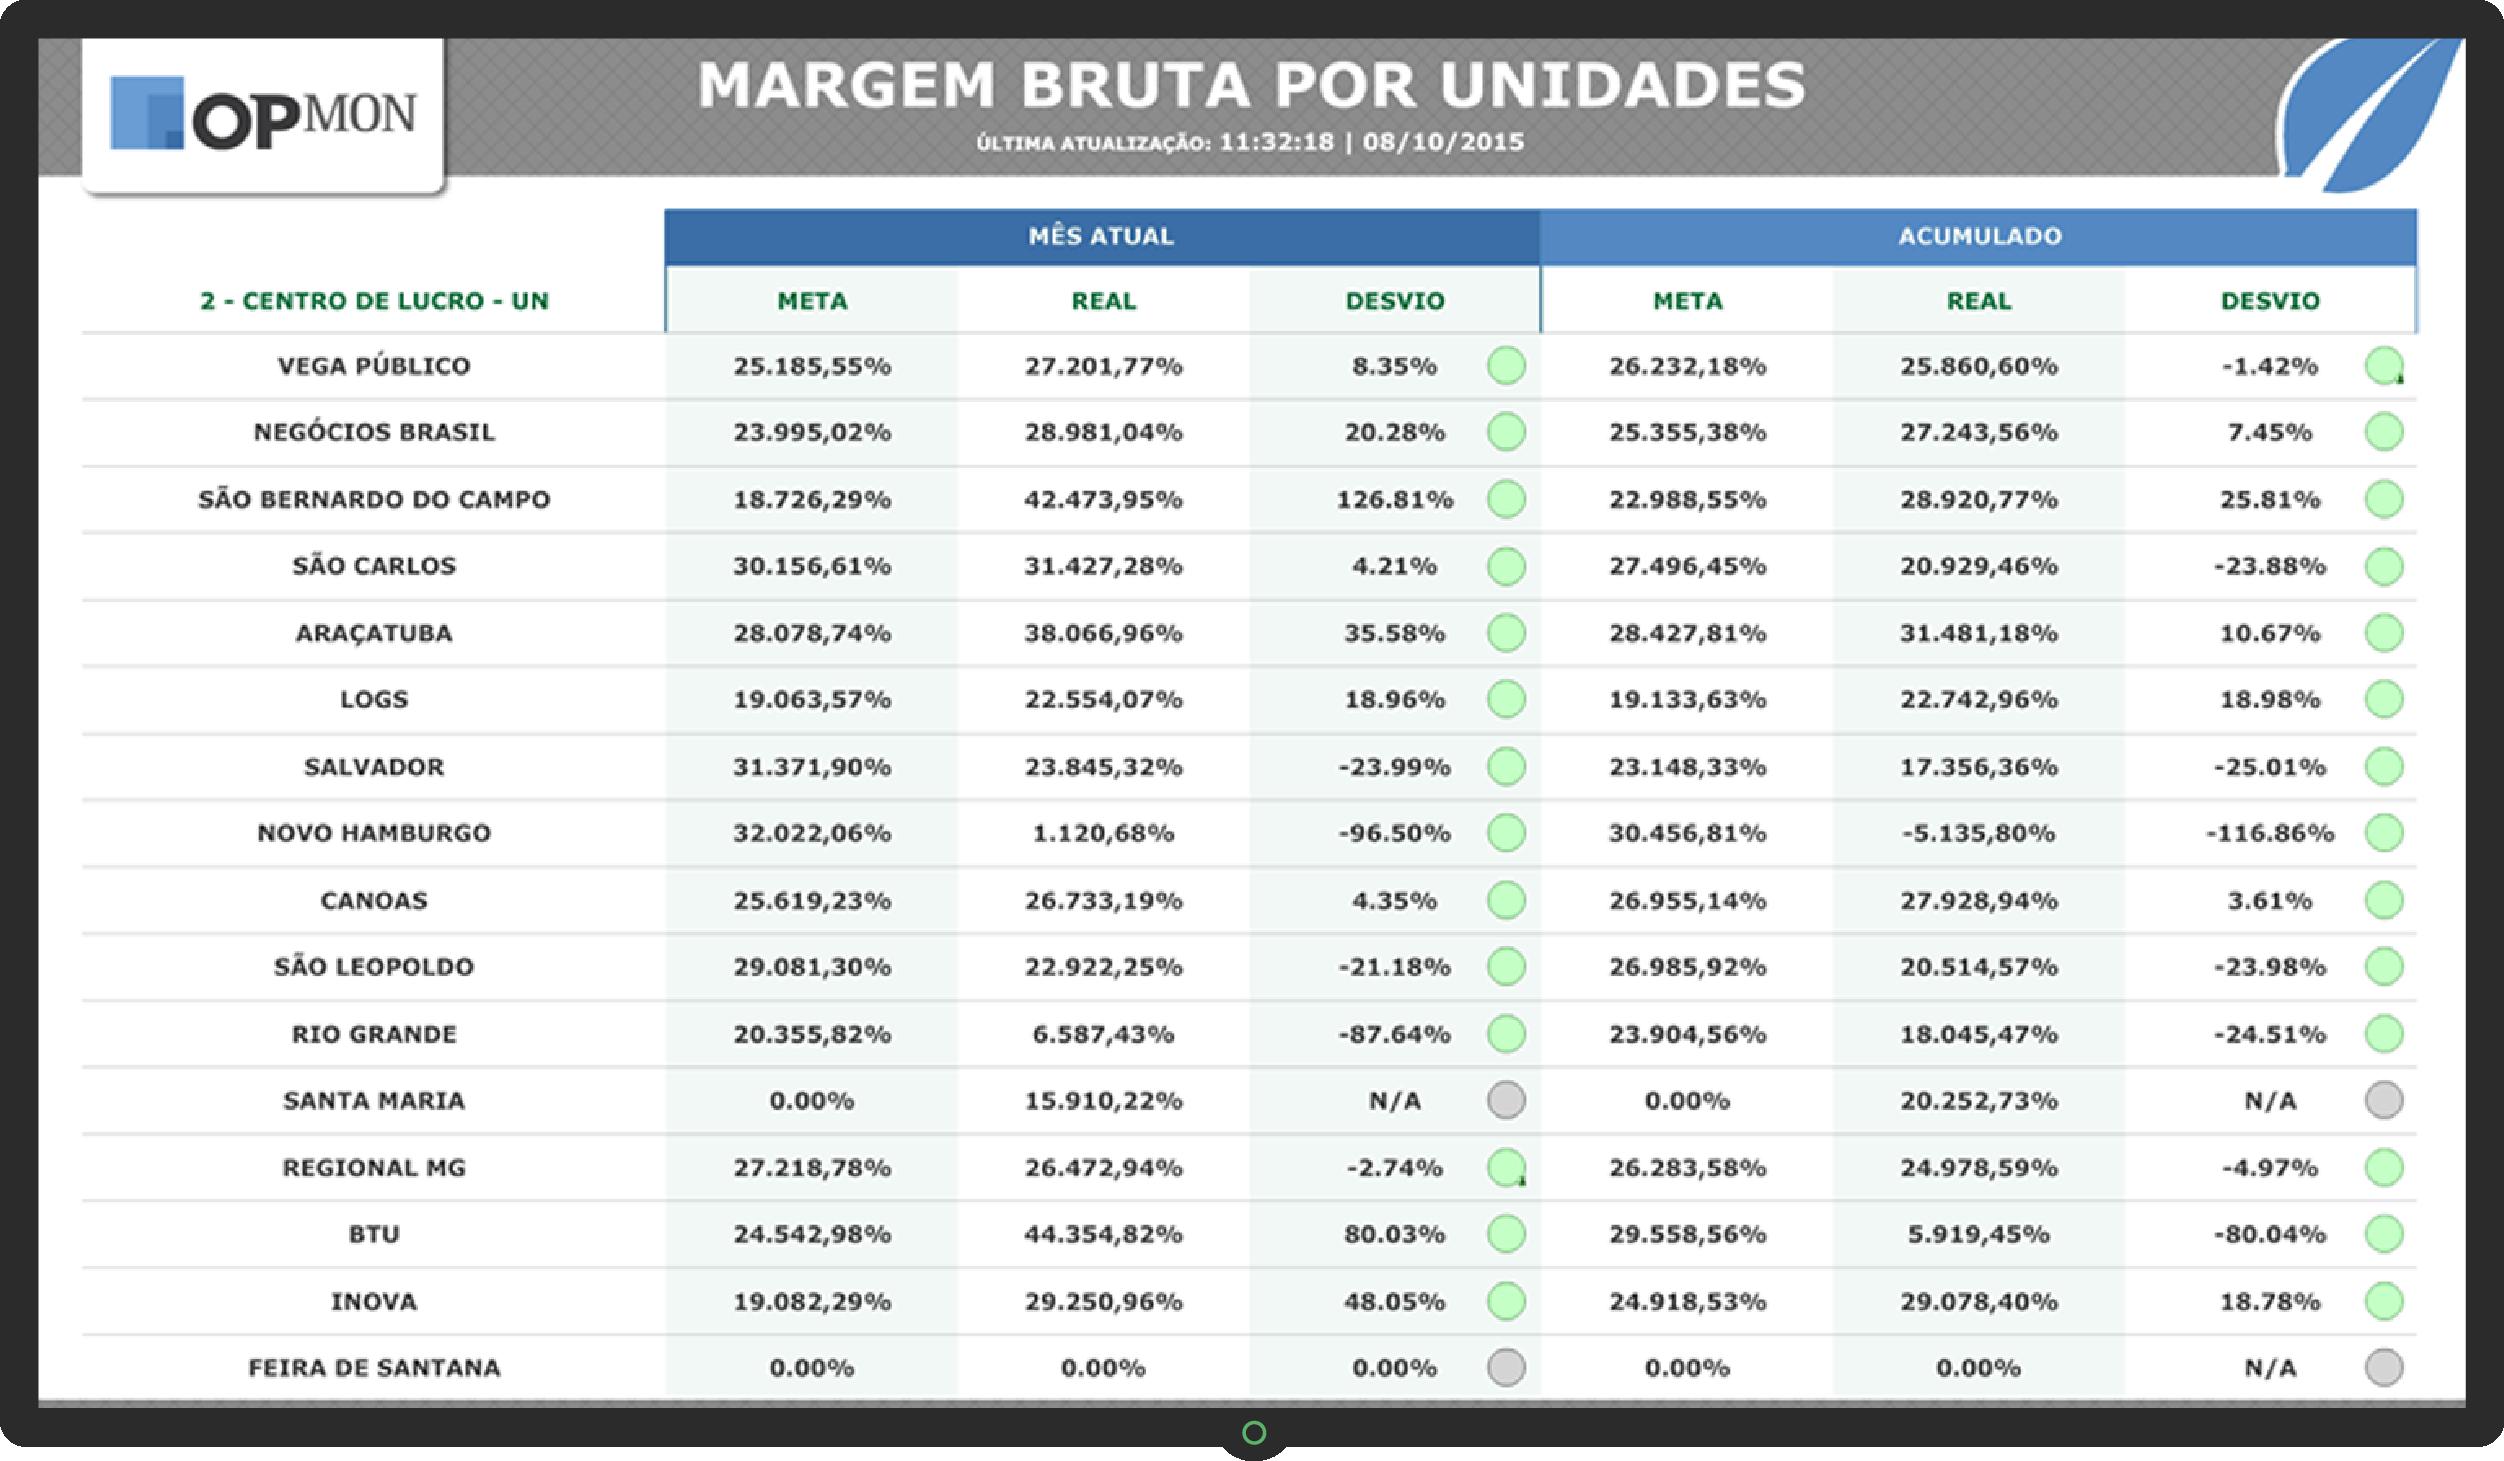 Financeiro_MargemBruta